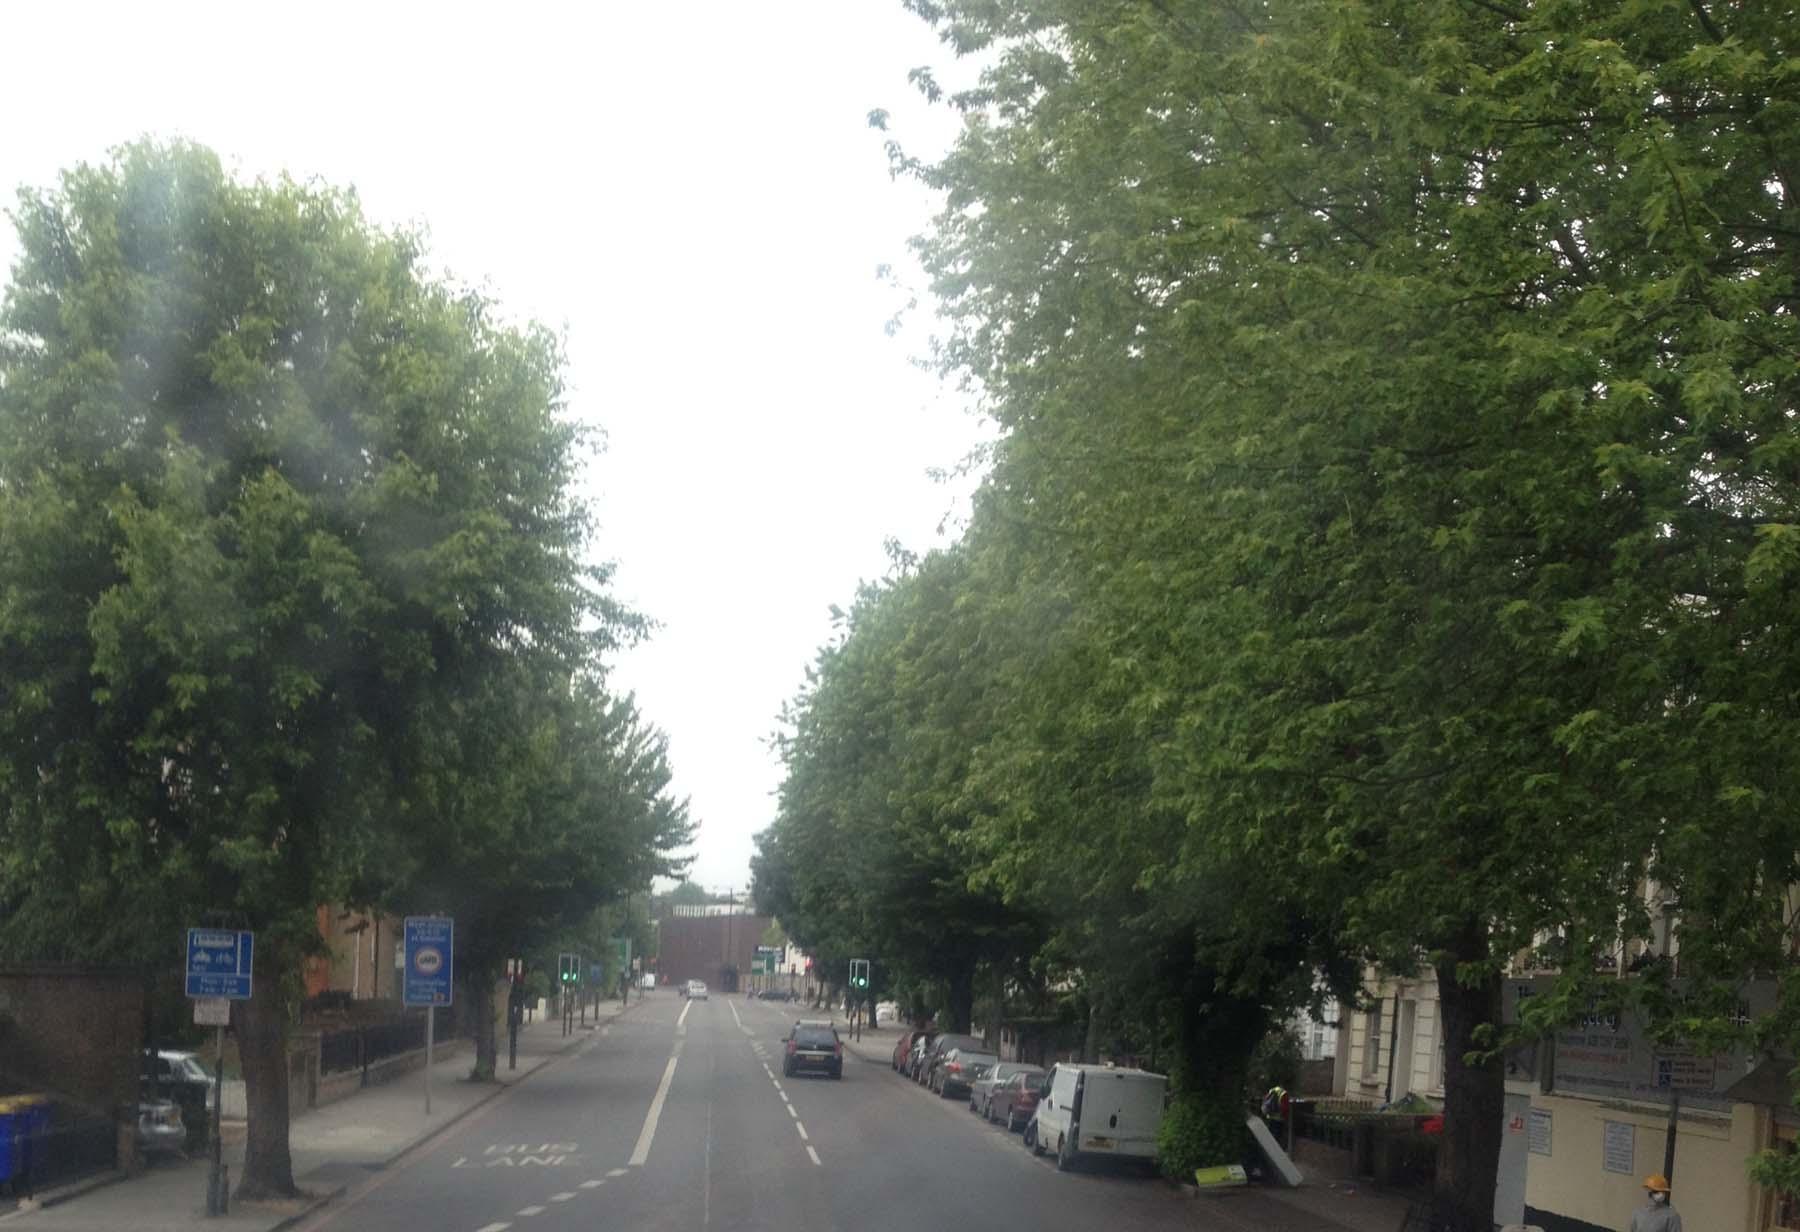 green London trees